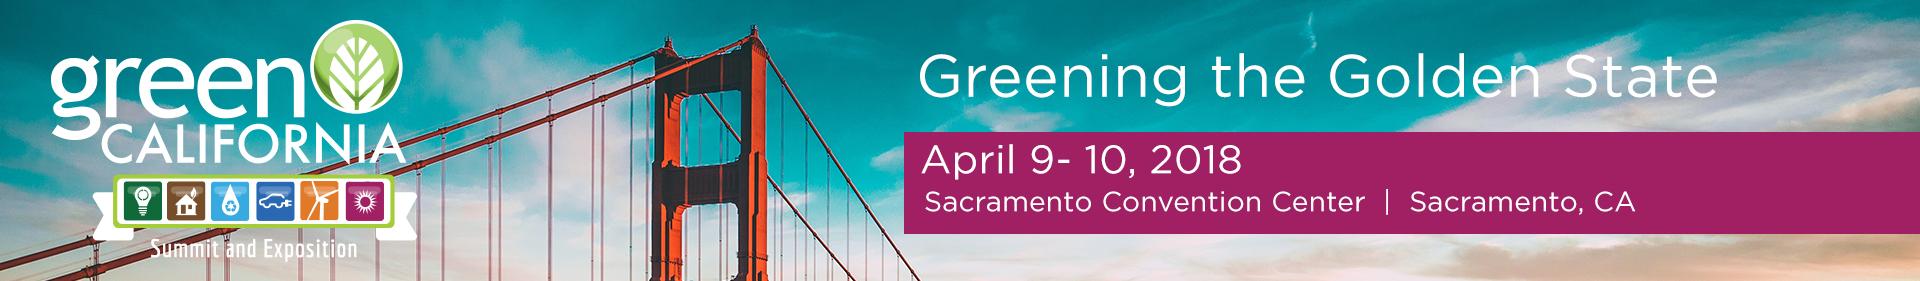 greenca-banner-3.jpg